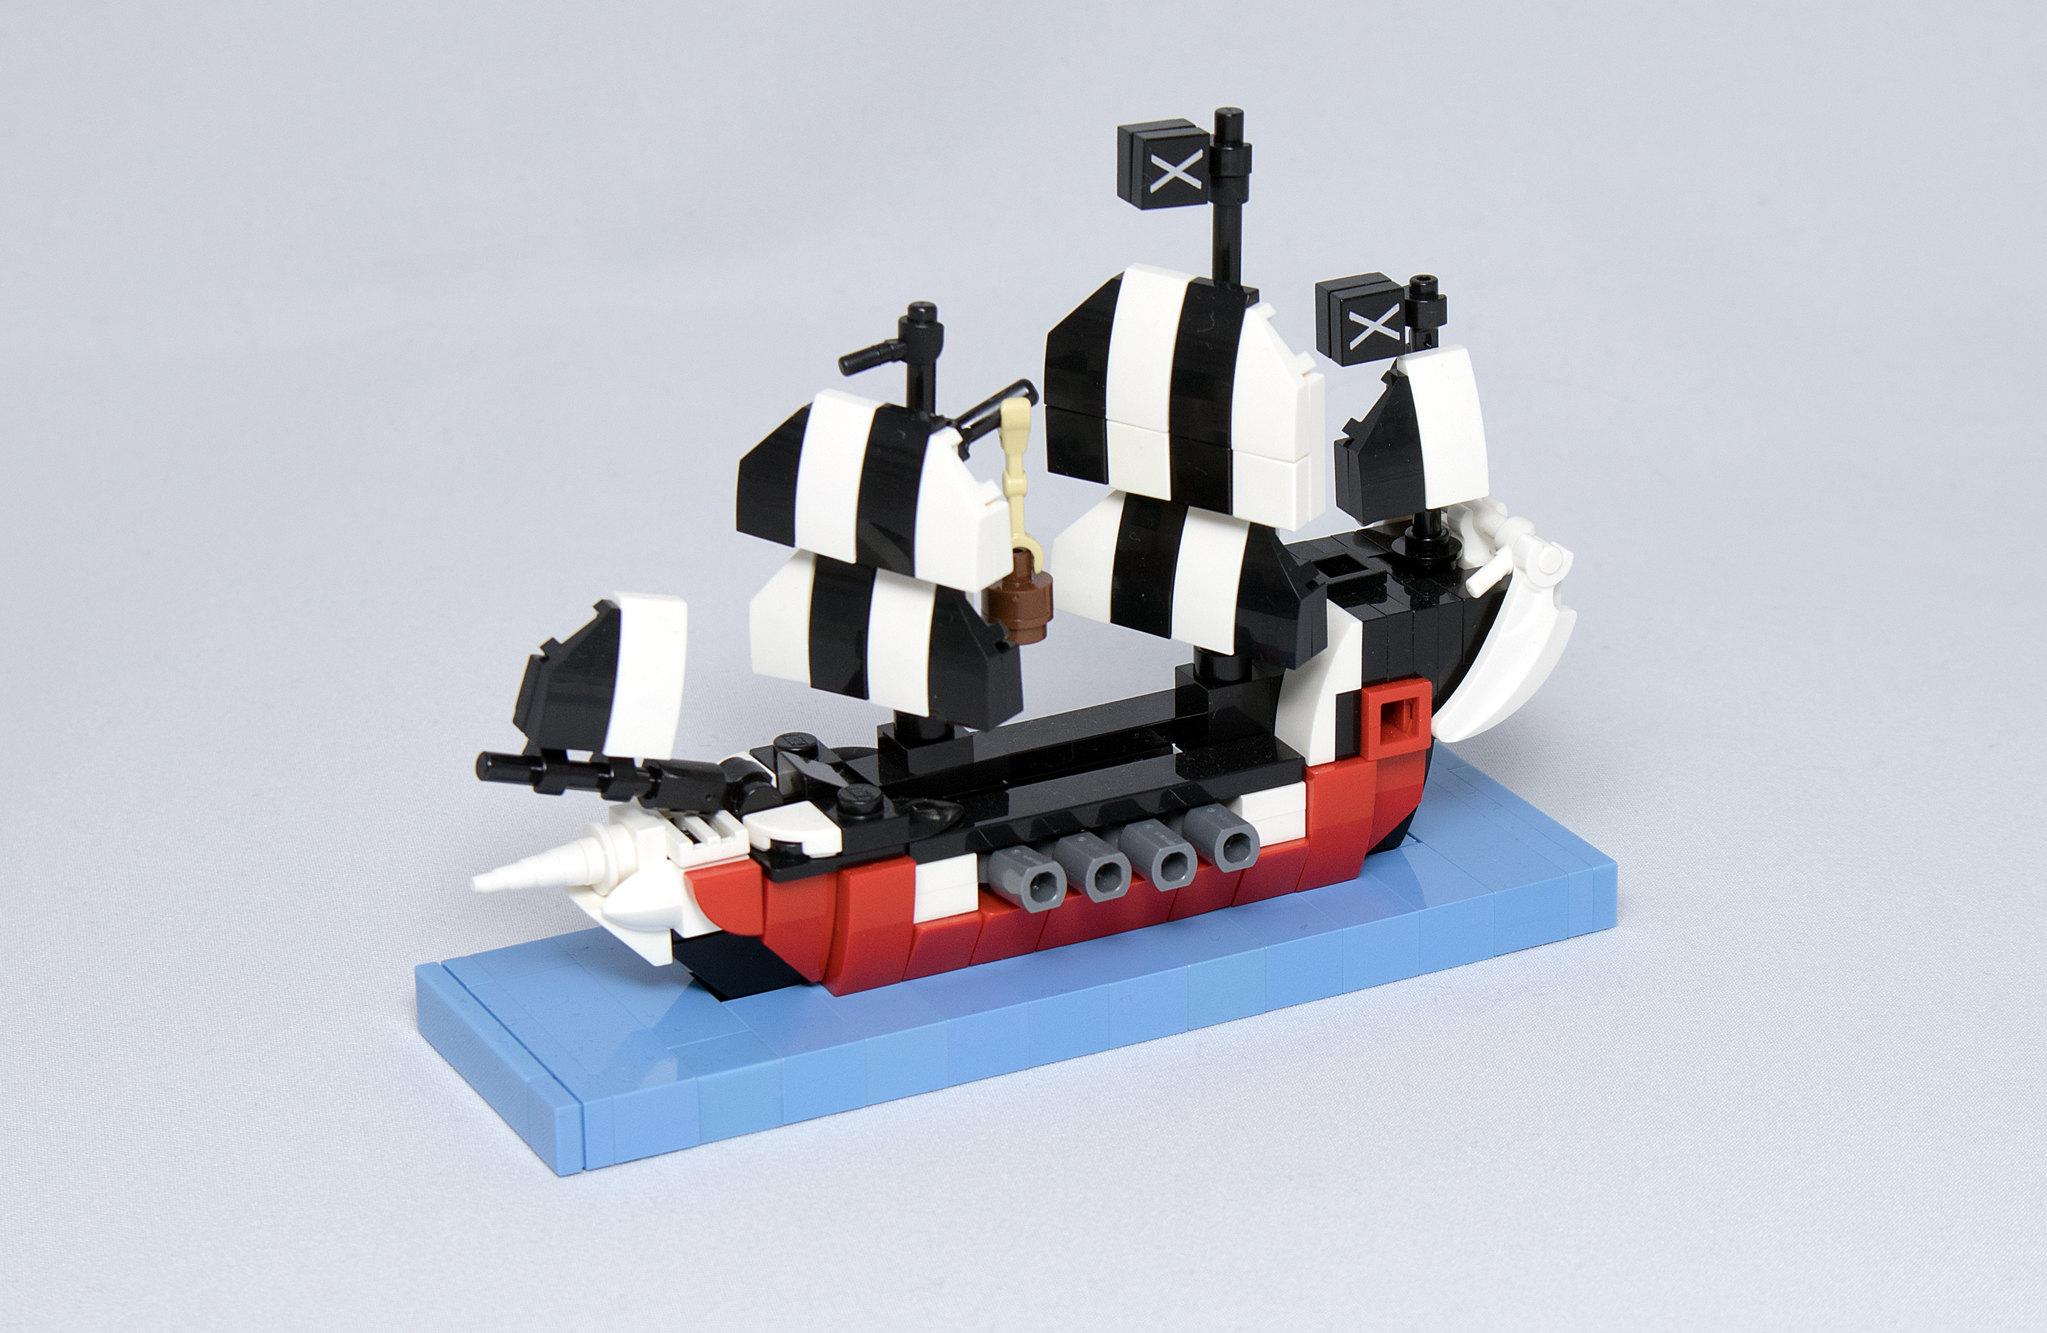 LEGO® MOC by Vitreolum: 6286 Skull's Eye Schooner Micro